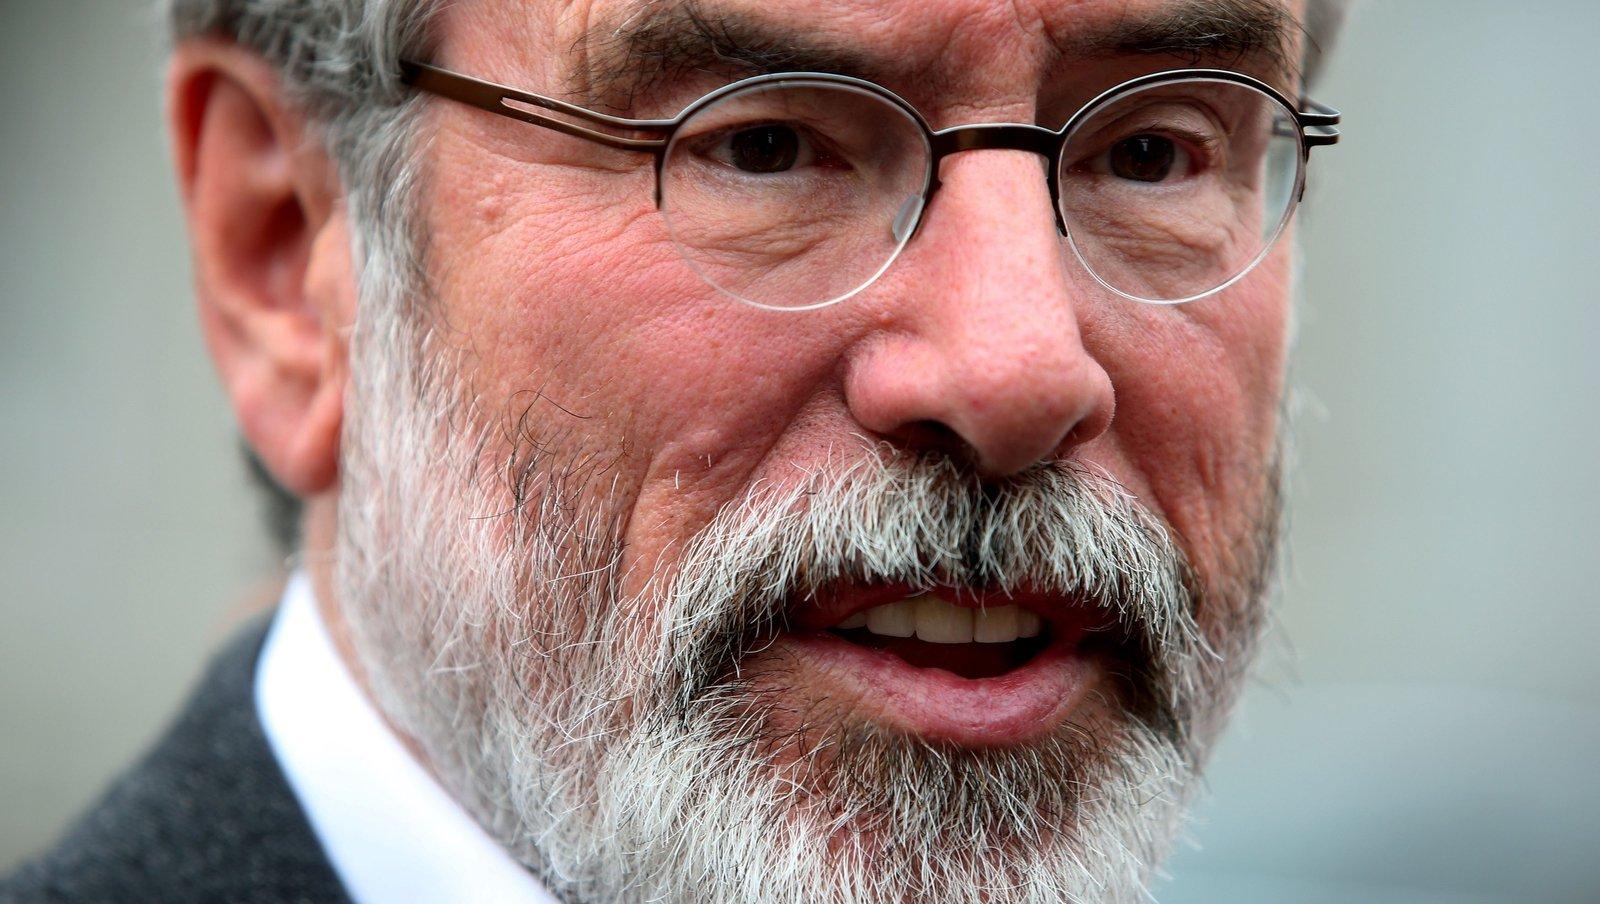 Adams says Sinn Féin not directed by any outside body